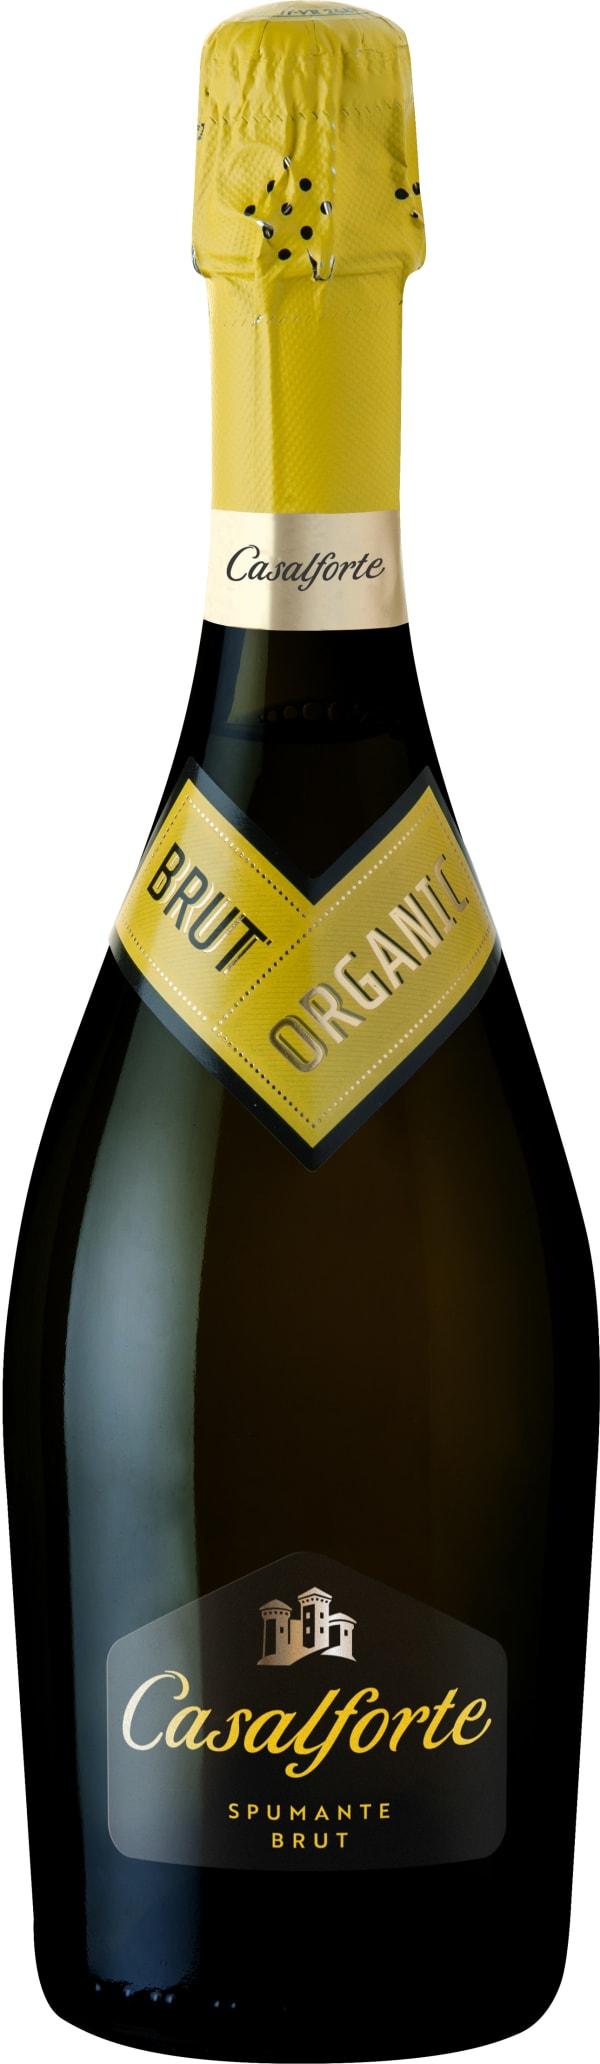 Castelforte Organic Brut